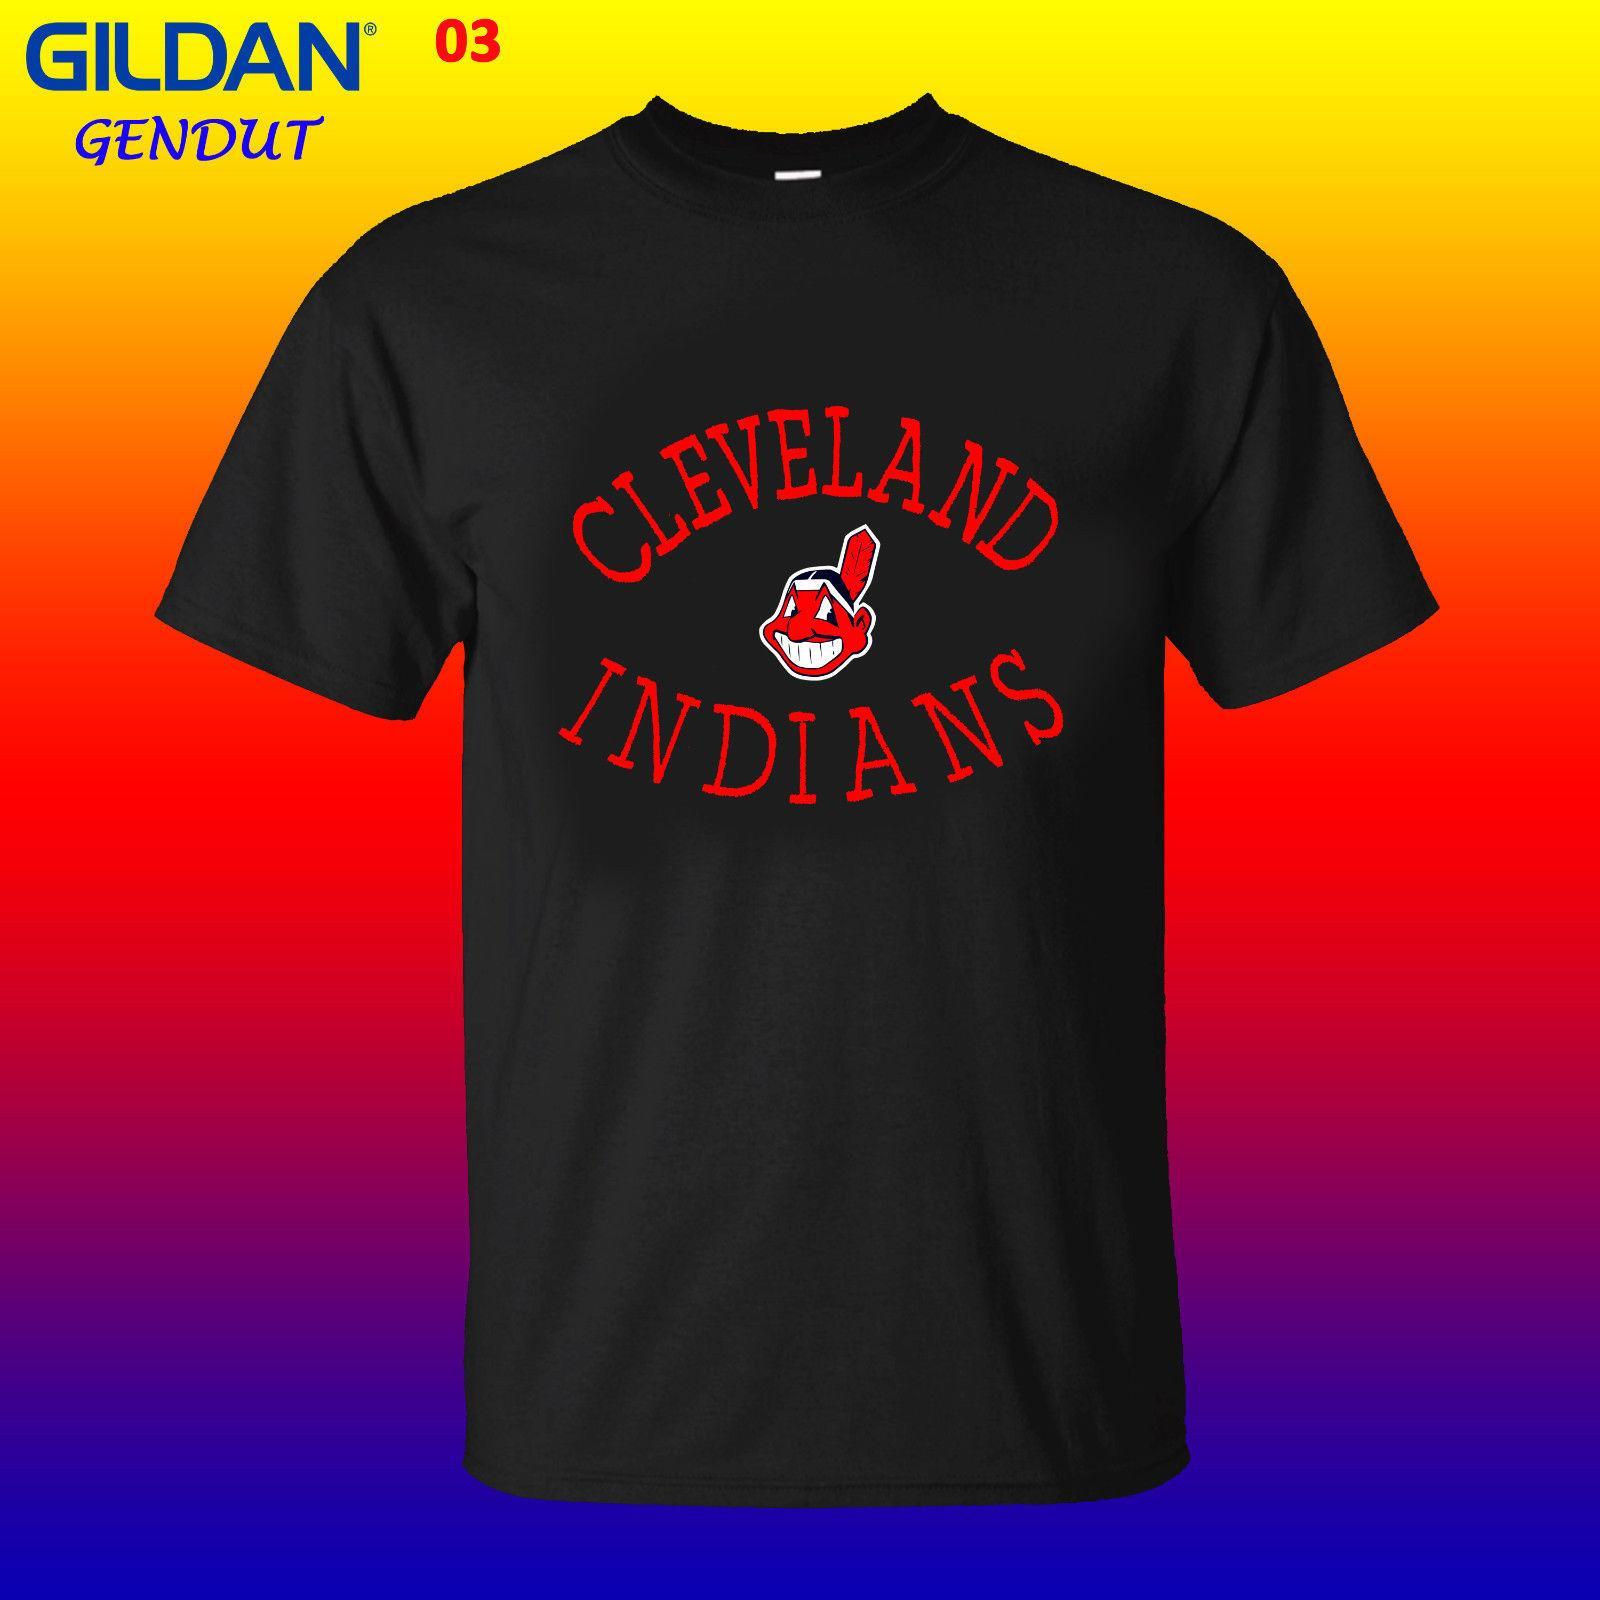 403731d5 New Chief Wahoo Cleveland Indians Tshirt Mens Cloting S 2XL 2018 Short  Sleeve T Shirt Men Fashion Brand Design 100% Make Your Own Tee Shirt Design  Crazy T ...